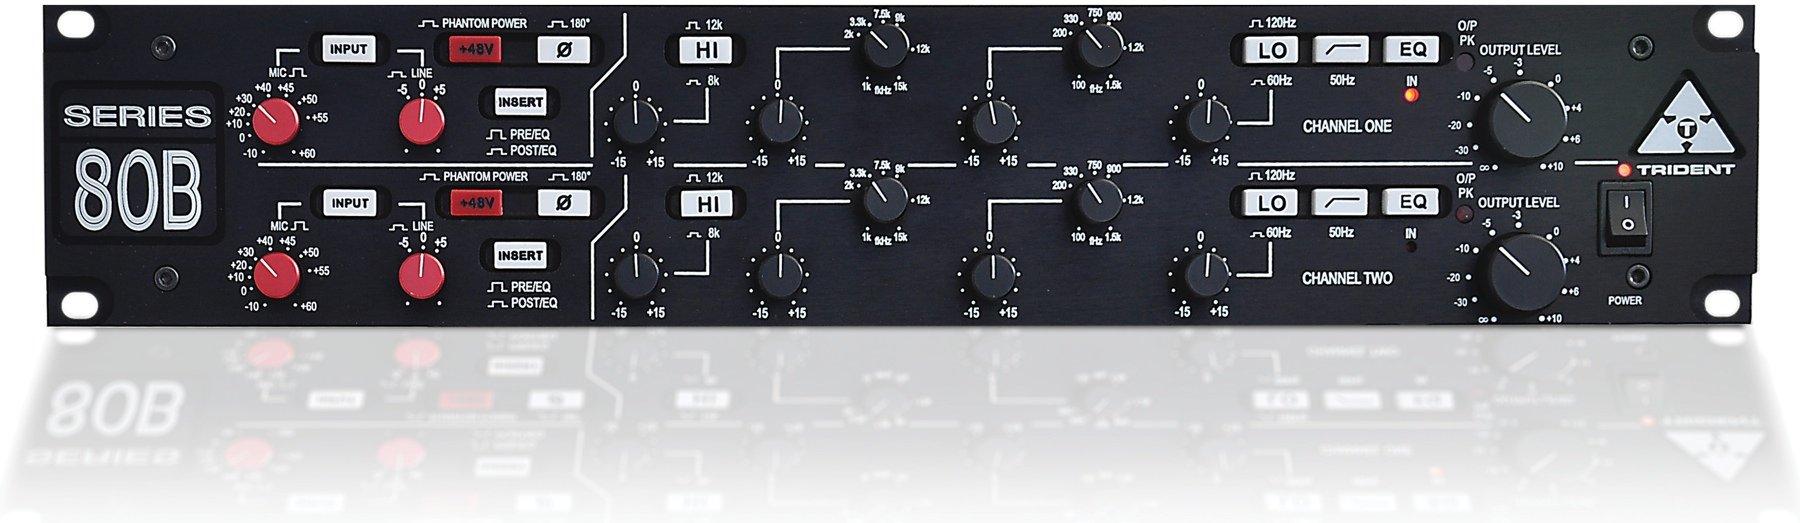 Trident Audio Developments Series 80b Sweetwater Snapshoot Of Studio Stereo Headphone Amplifier Circuit Image 1